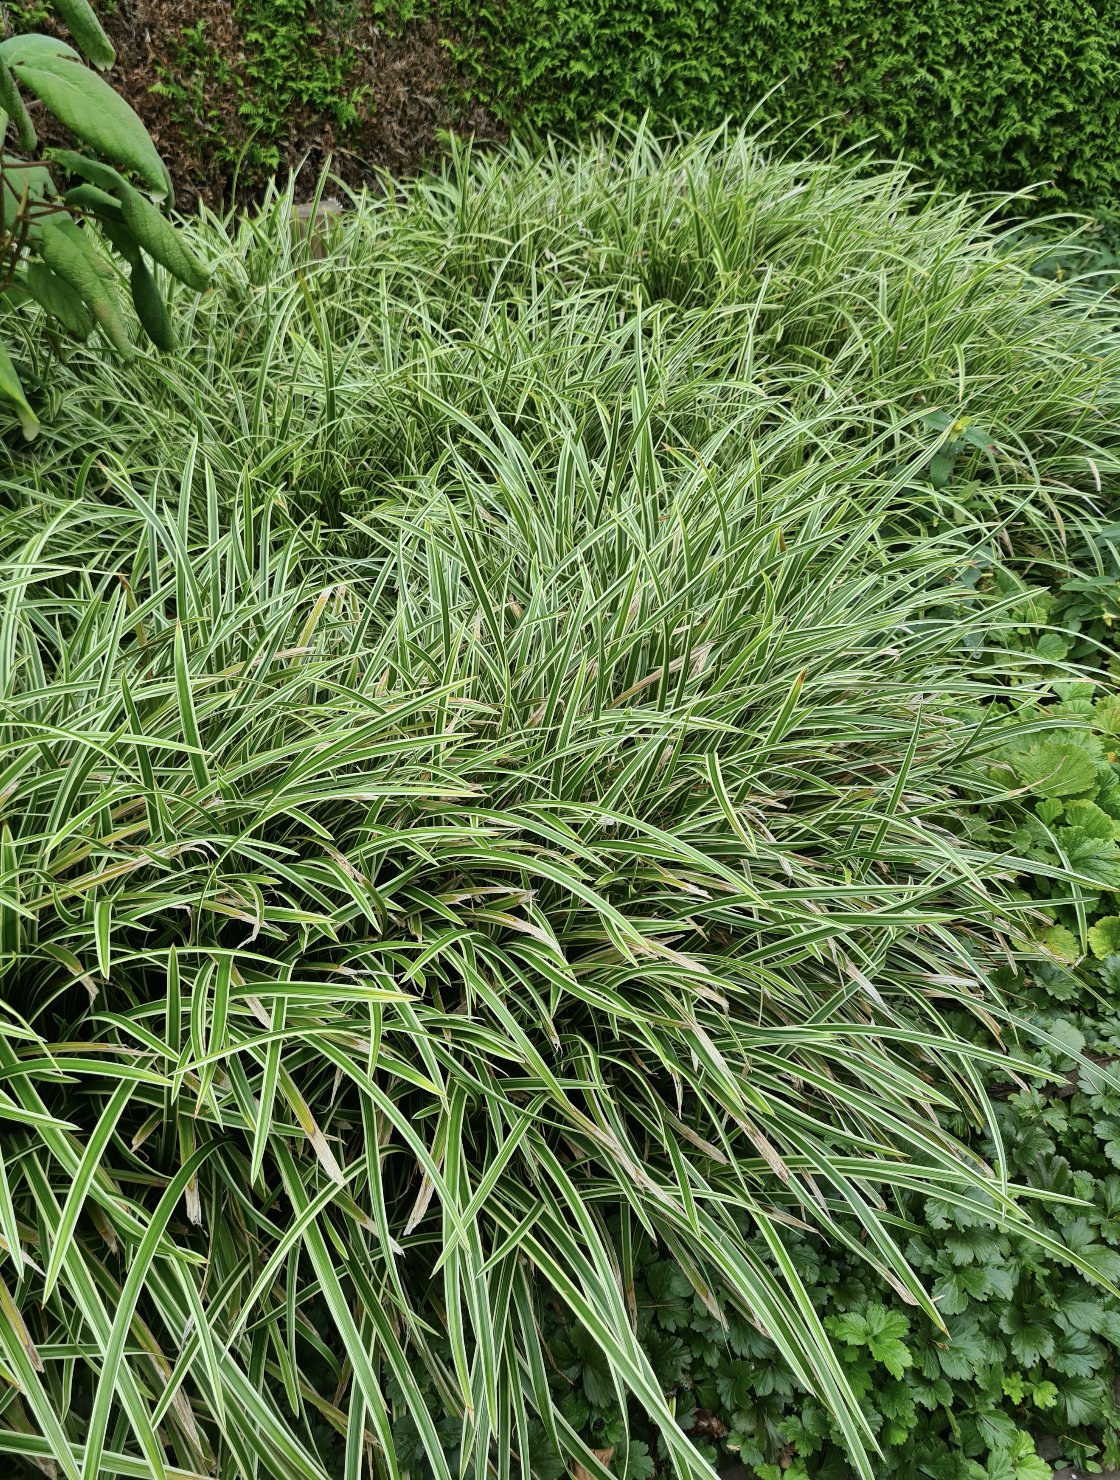 Zegge - Carex morrowii 'Variegata'